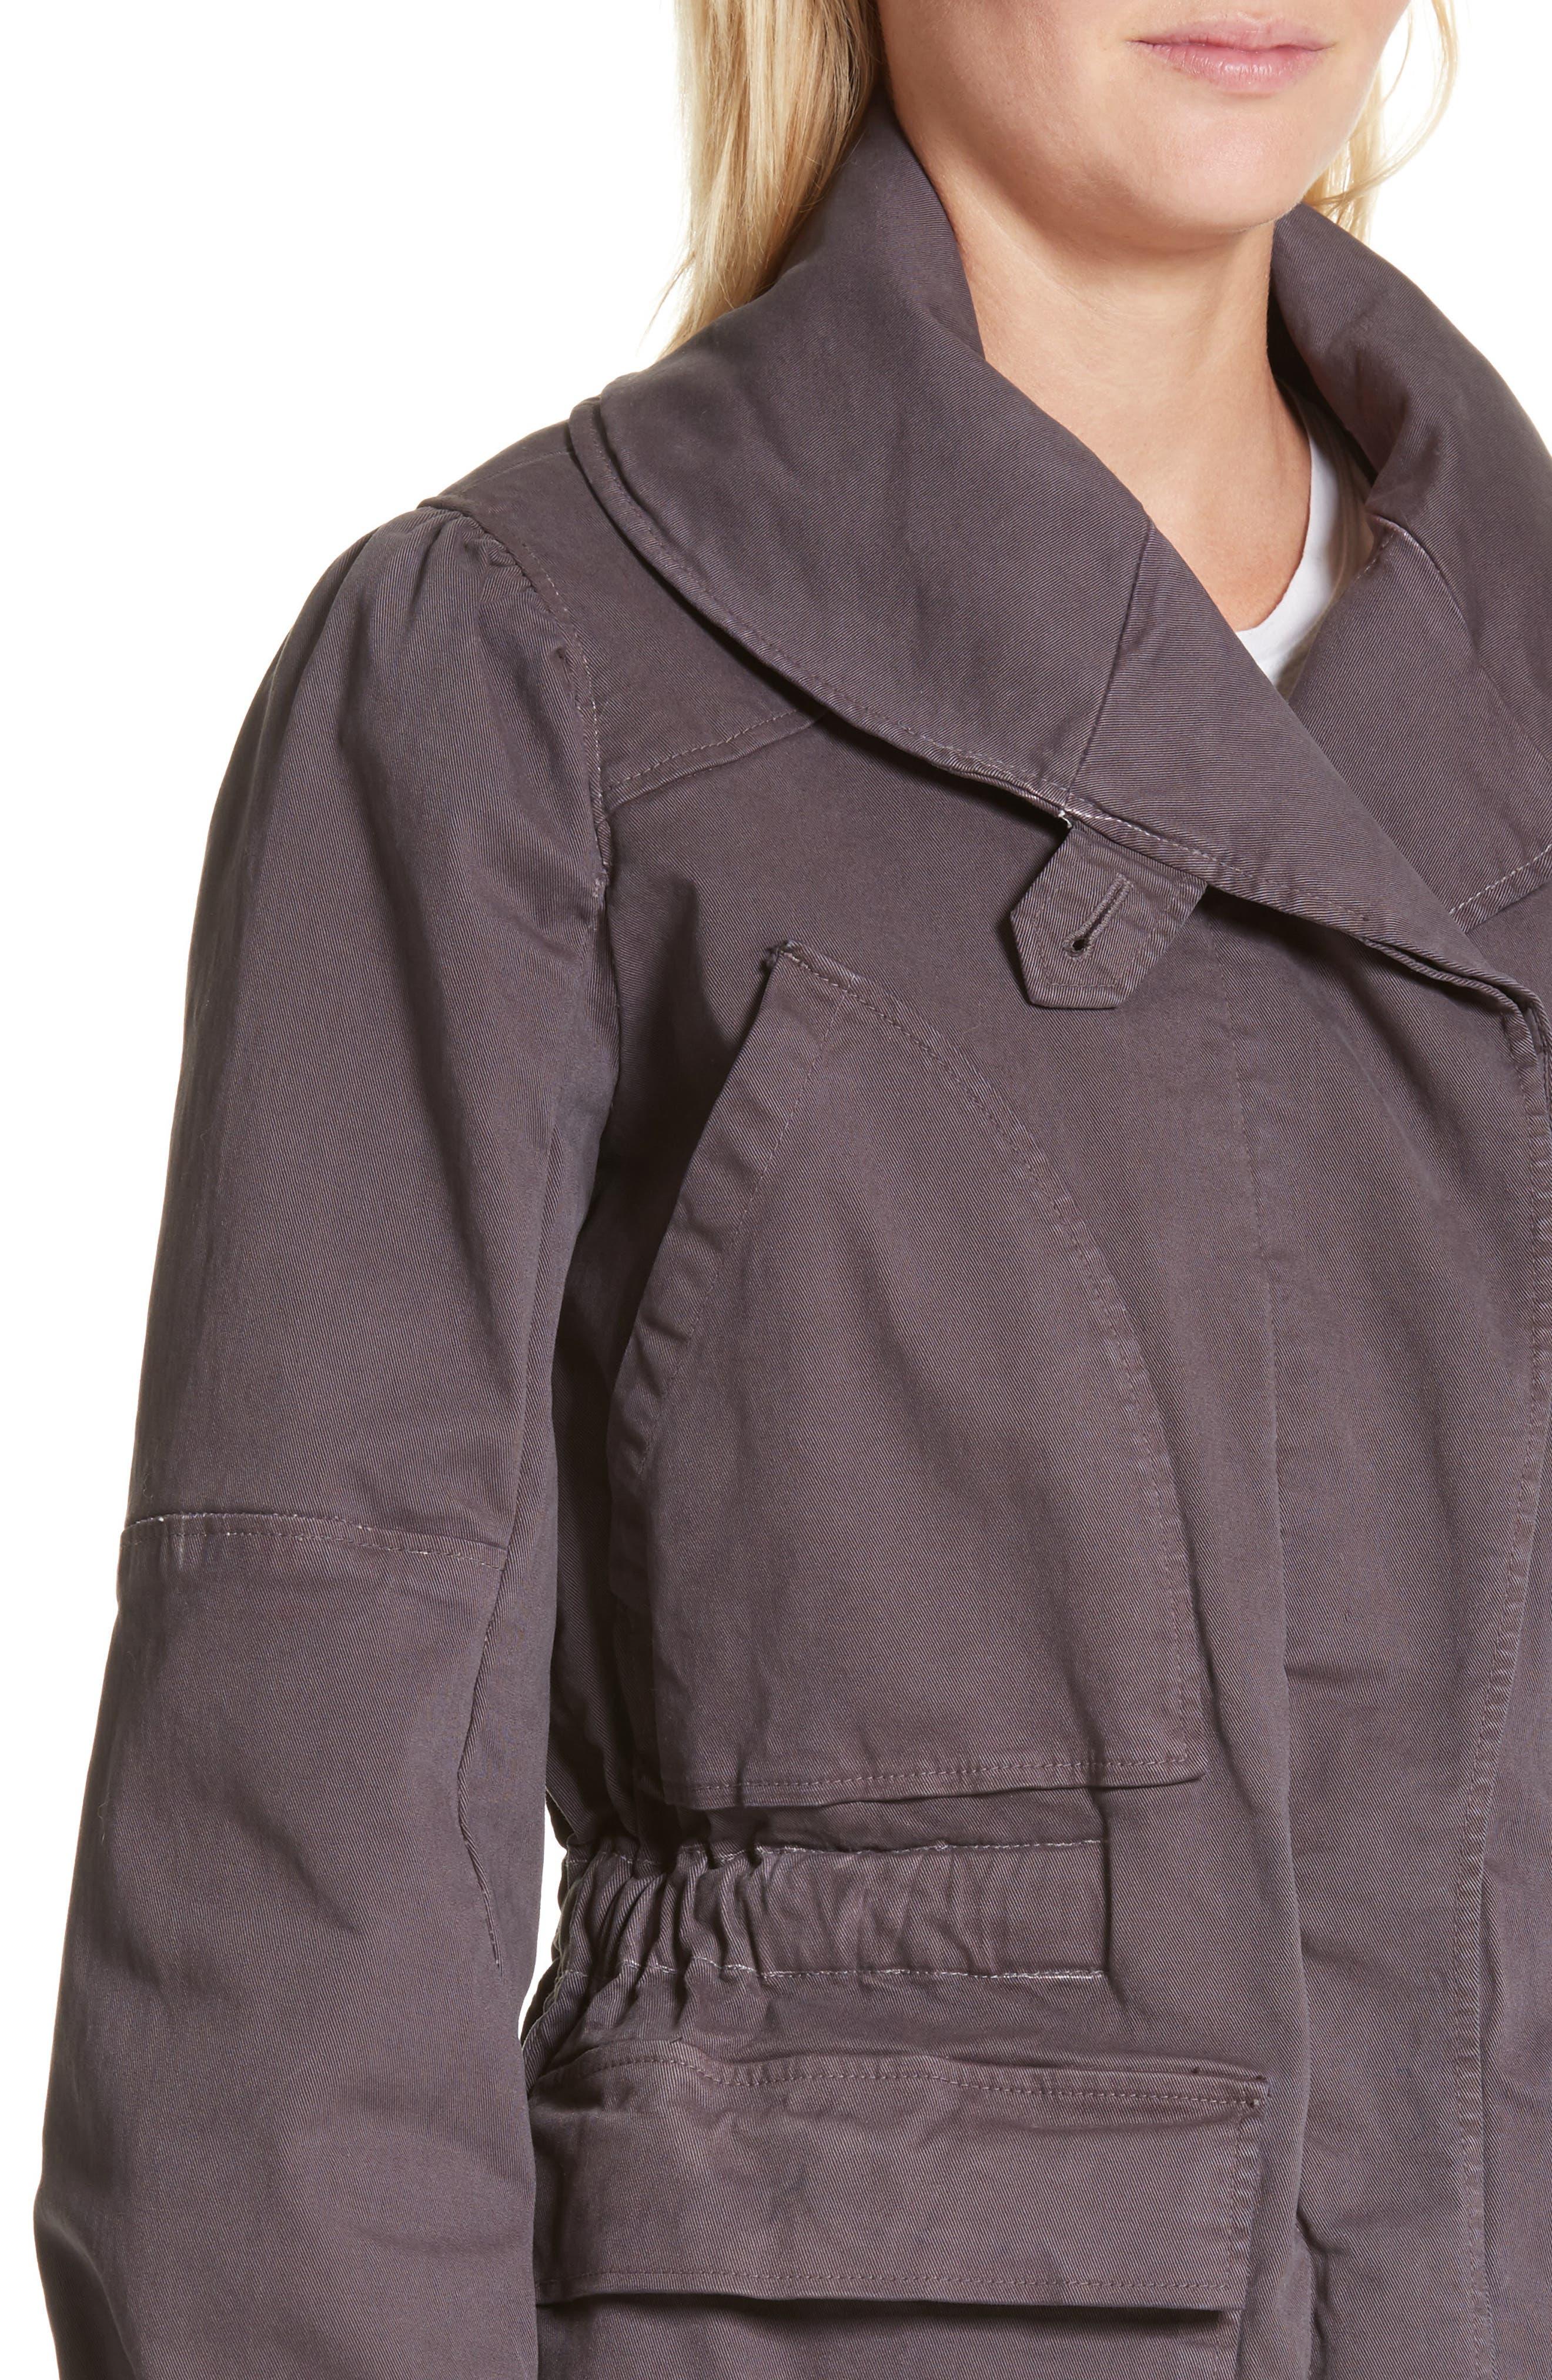 Twill Utility Jacket,                             Alternate thumbnail 4, color,                             Shadow